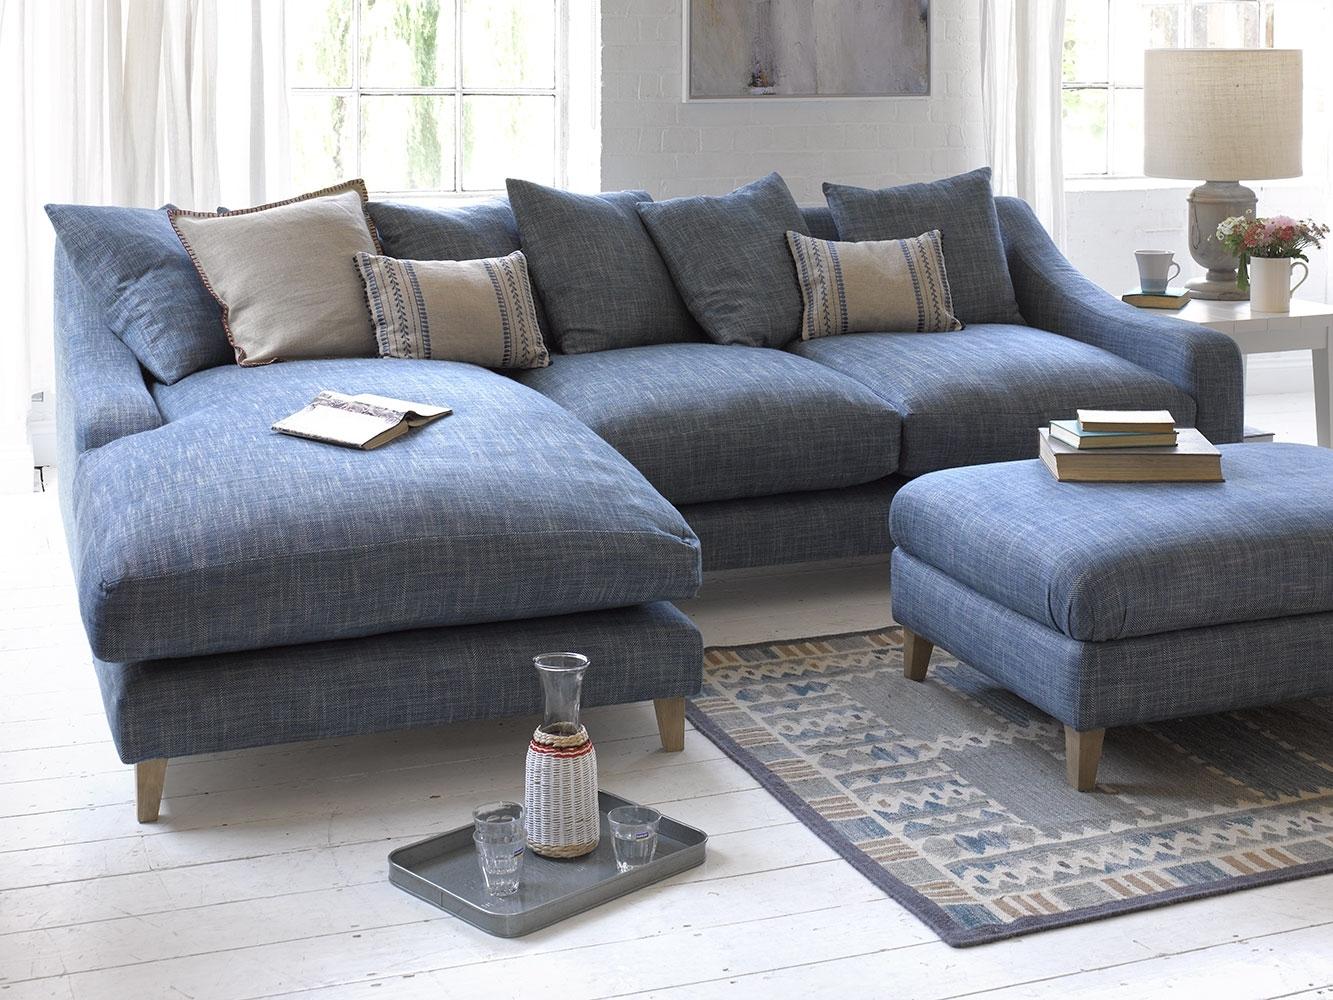 chez long sofa bed argos mini garden corner 10 43 choices of chaise sofas ideas